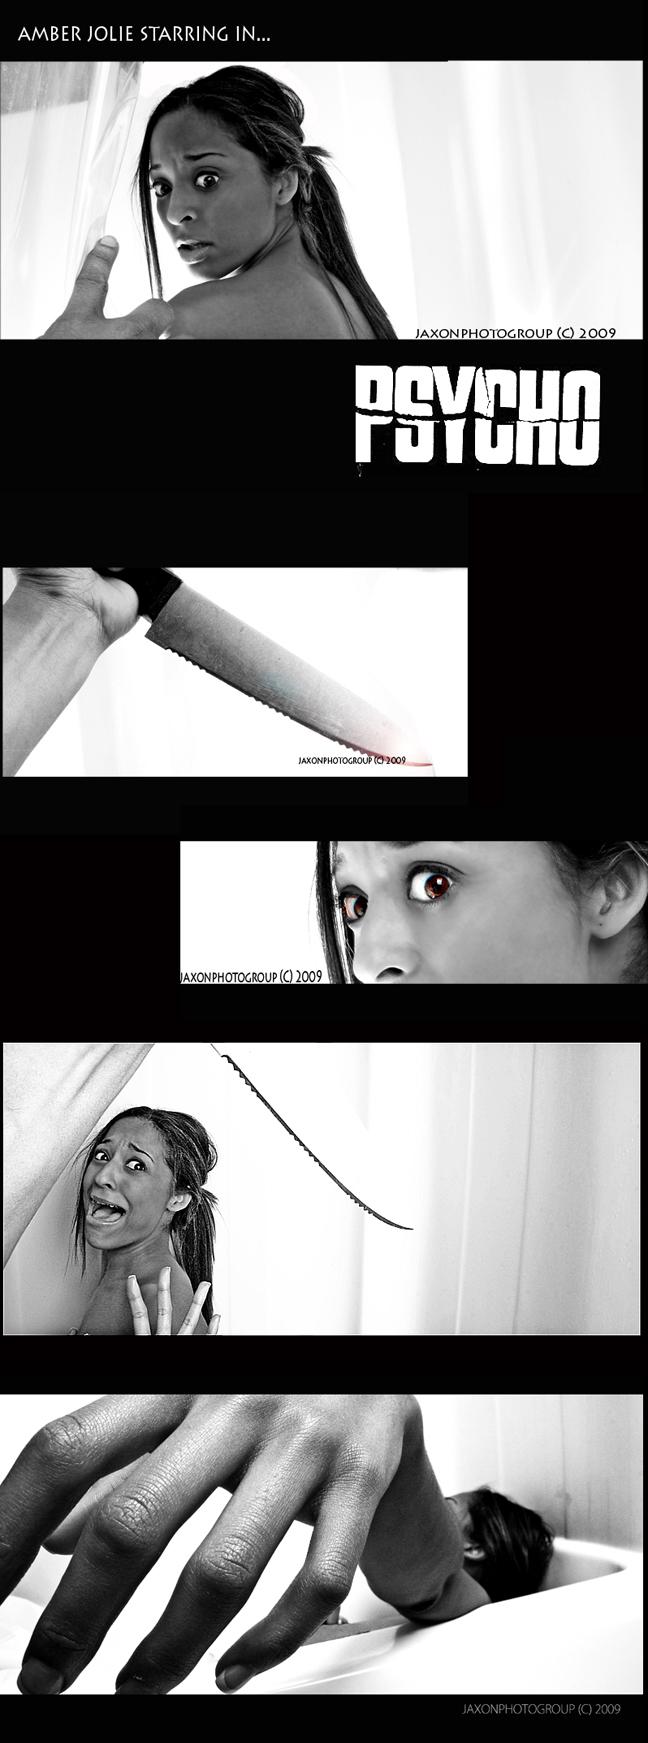 VA Mar 22, 2009 jaxonphotogroup (c) 2009 Psycho Movie Stills: Directed by Jack Manning III